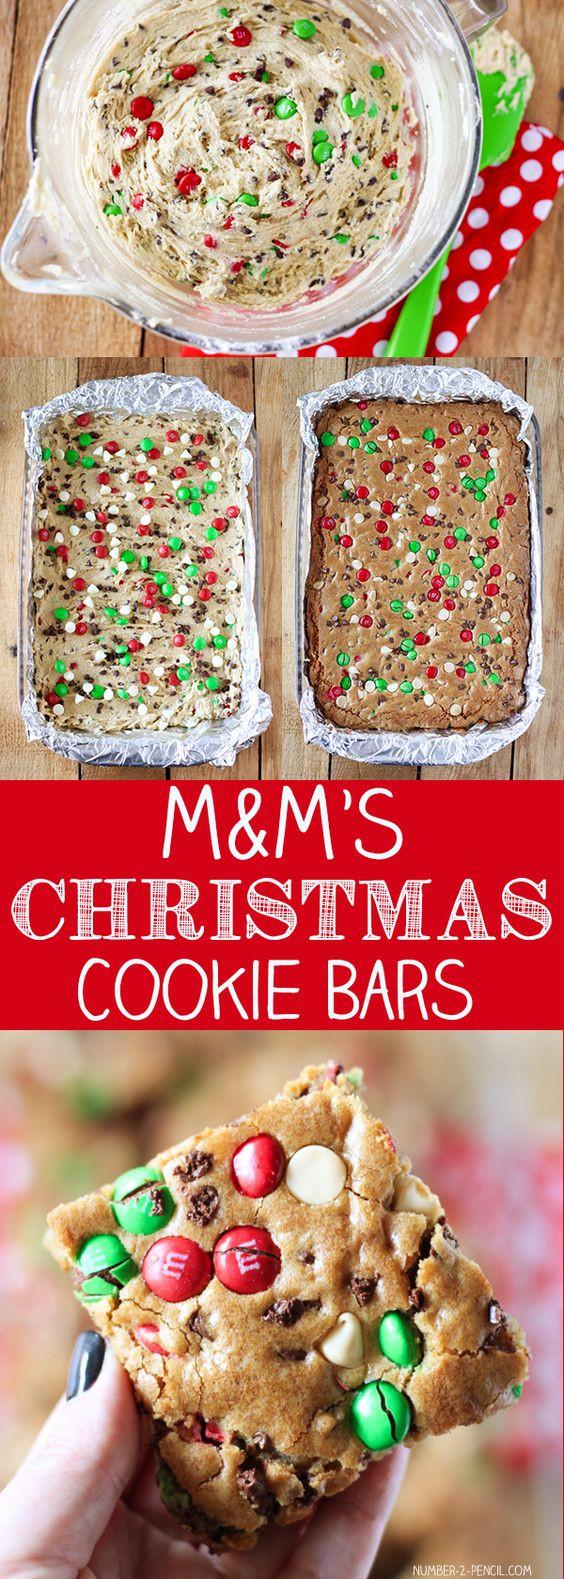 Christmas Cookies List  The Biggest List of the Cutest & Tastiest Christmas